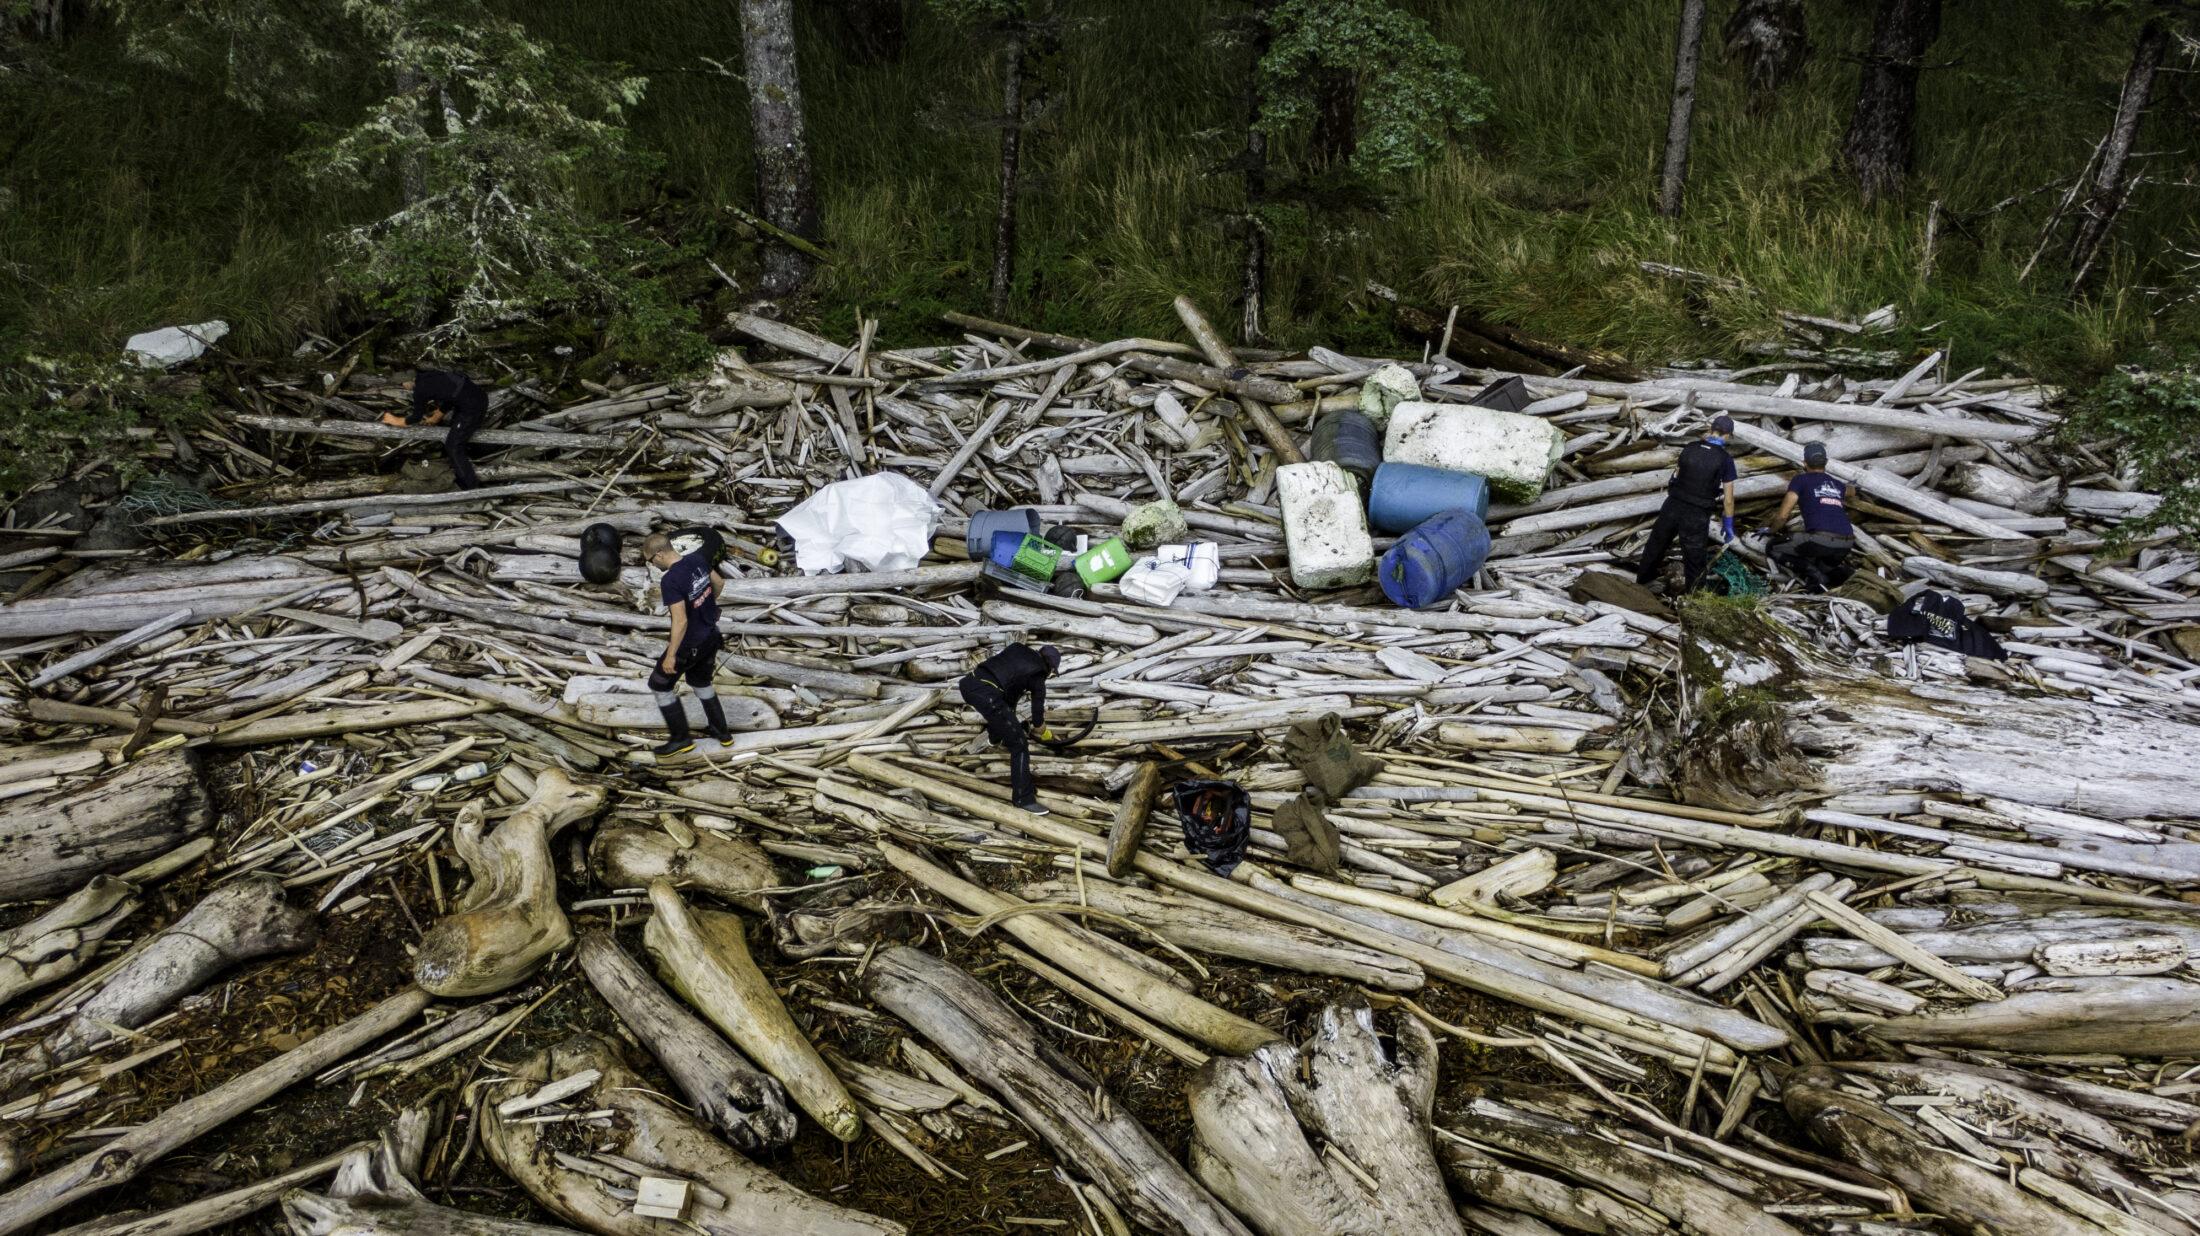 Walking on logs, Clean Coast, Clean Waters Initiative